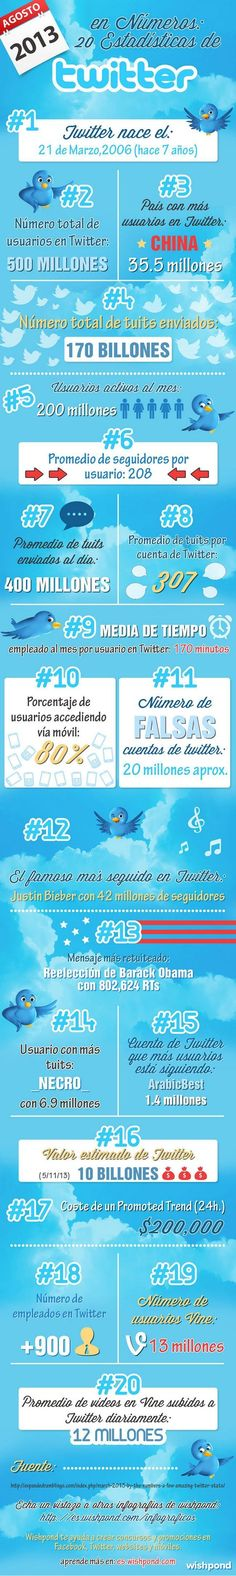 Cifras actualizadas de Twitter #infogtrafia